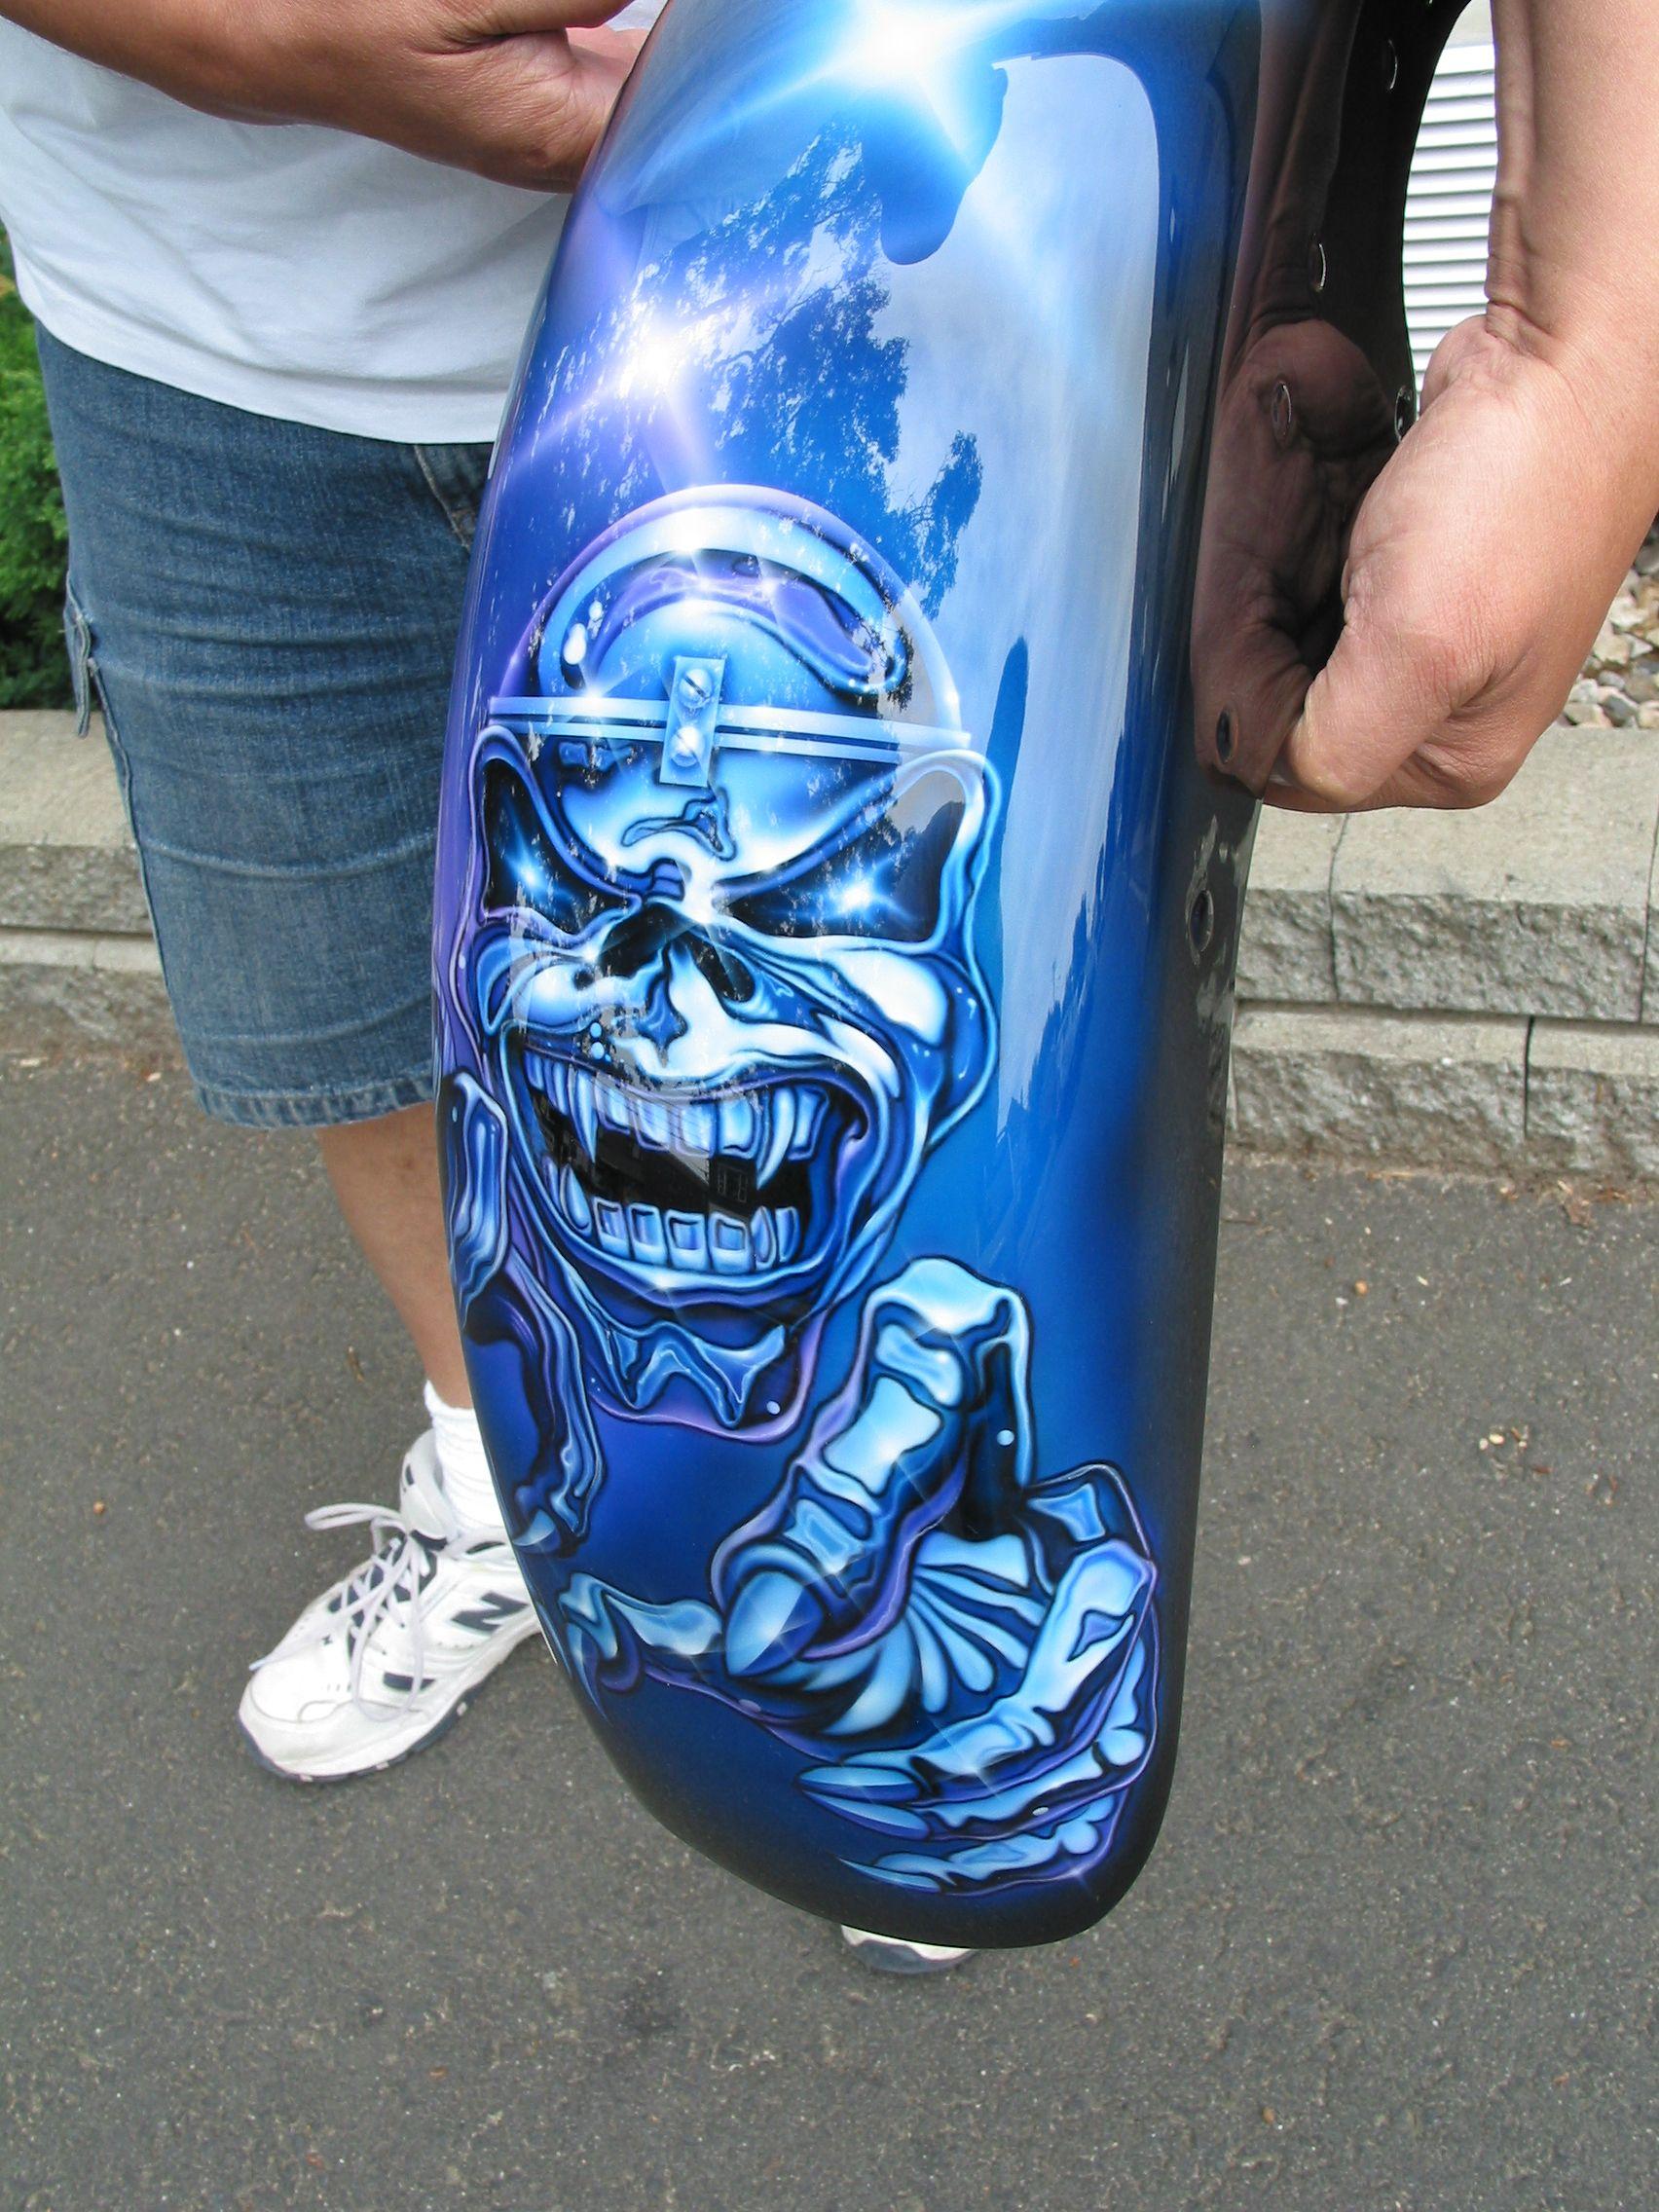 Iron Maiden Fender Favorite Rock Bands Airbrush Art